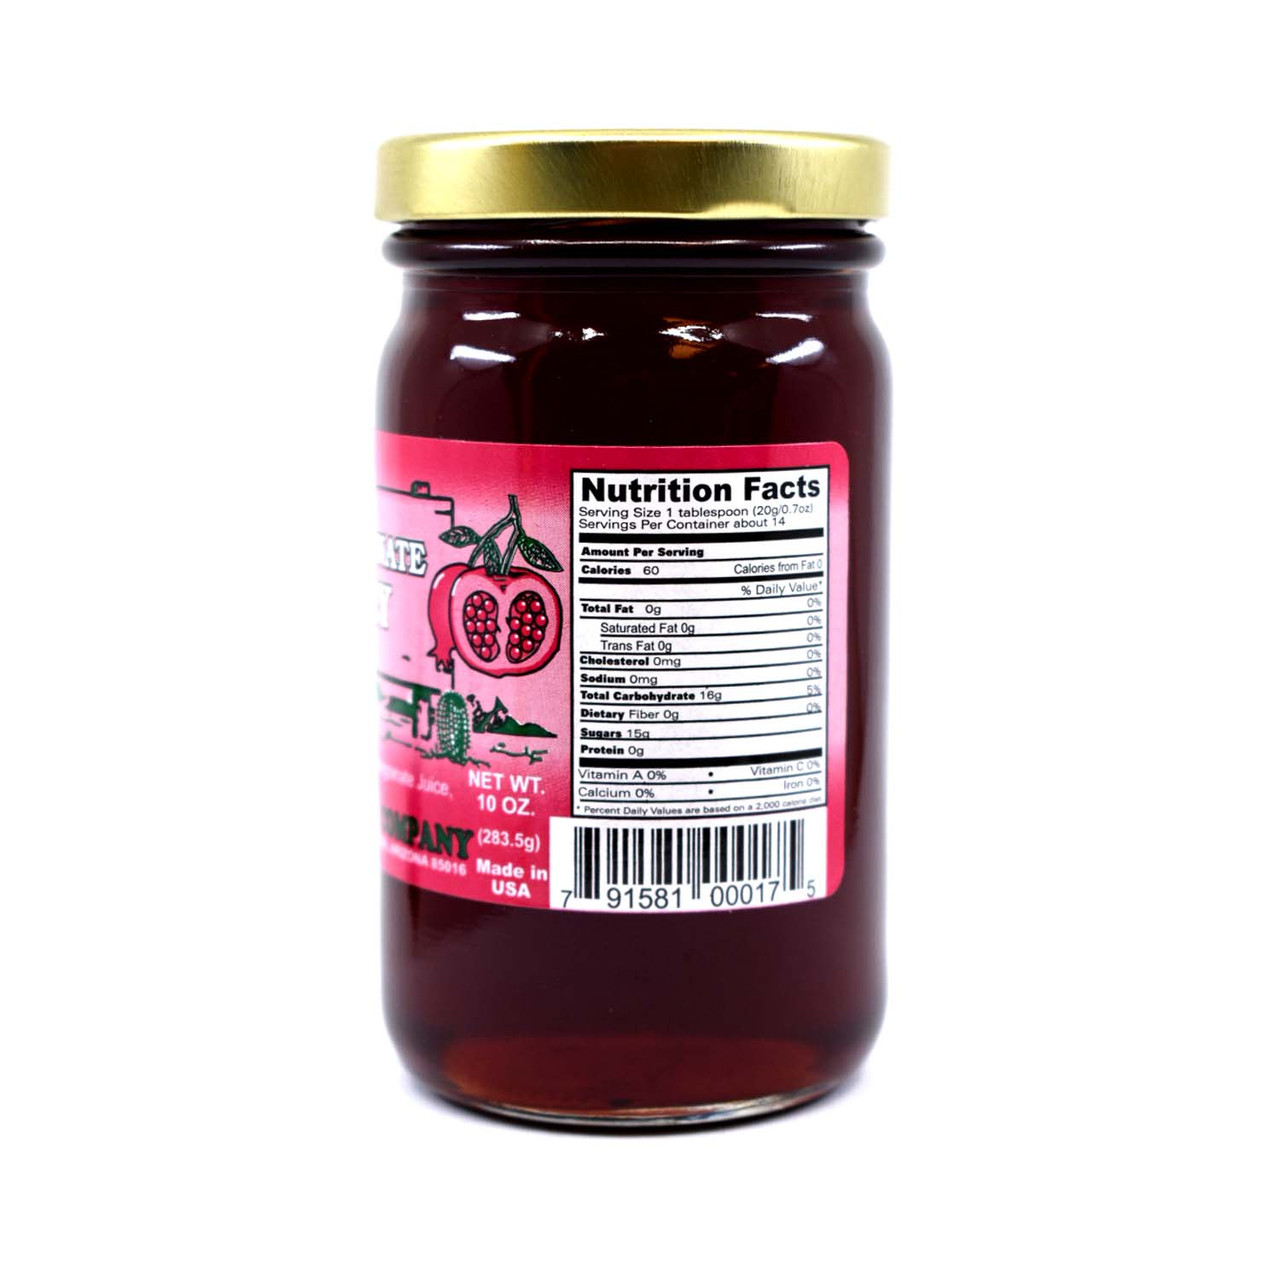 Pomegranate Jelly 10oz Glass Jar